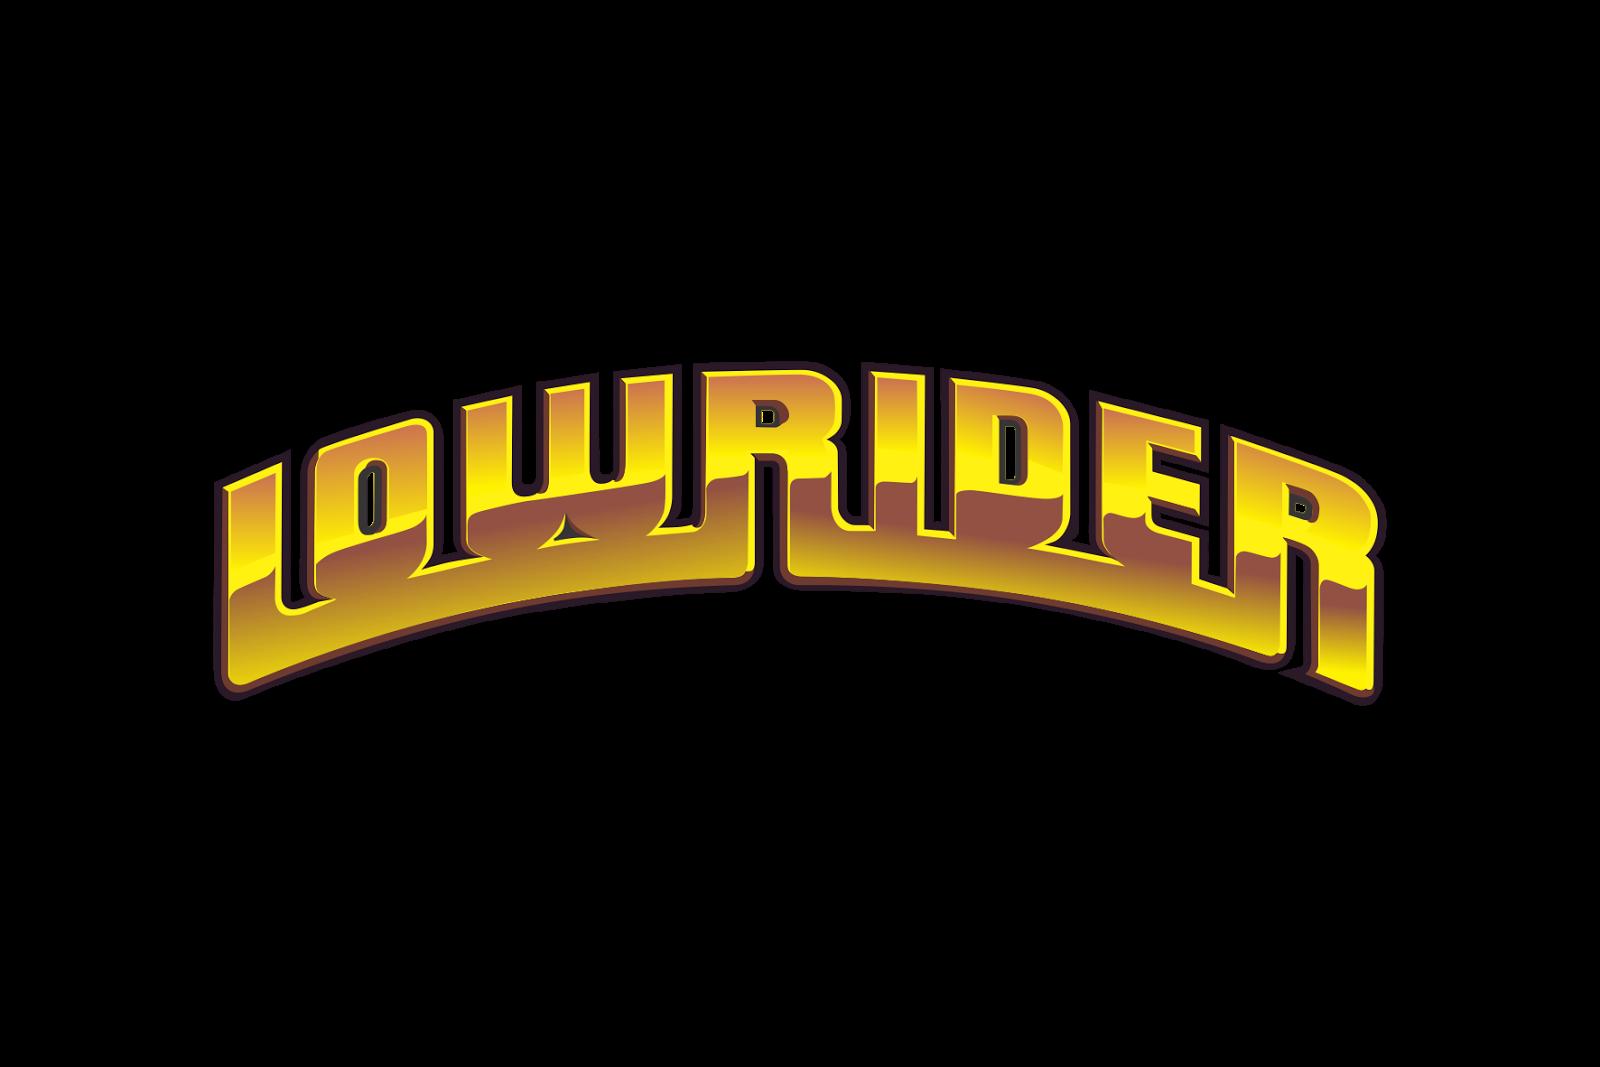 Lowrider Logo - Share Logo